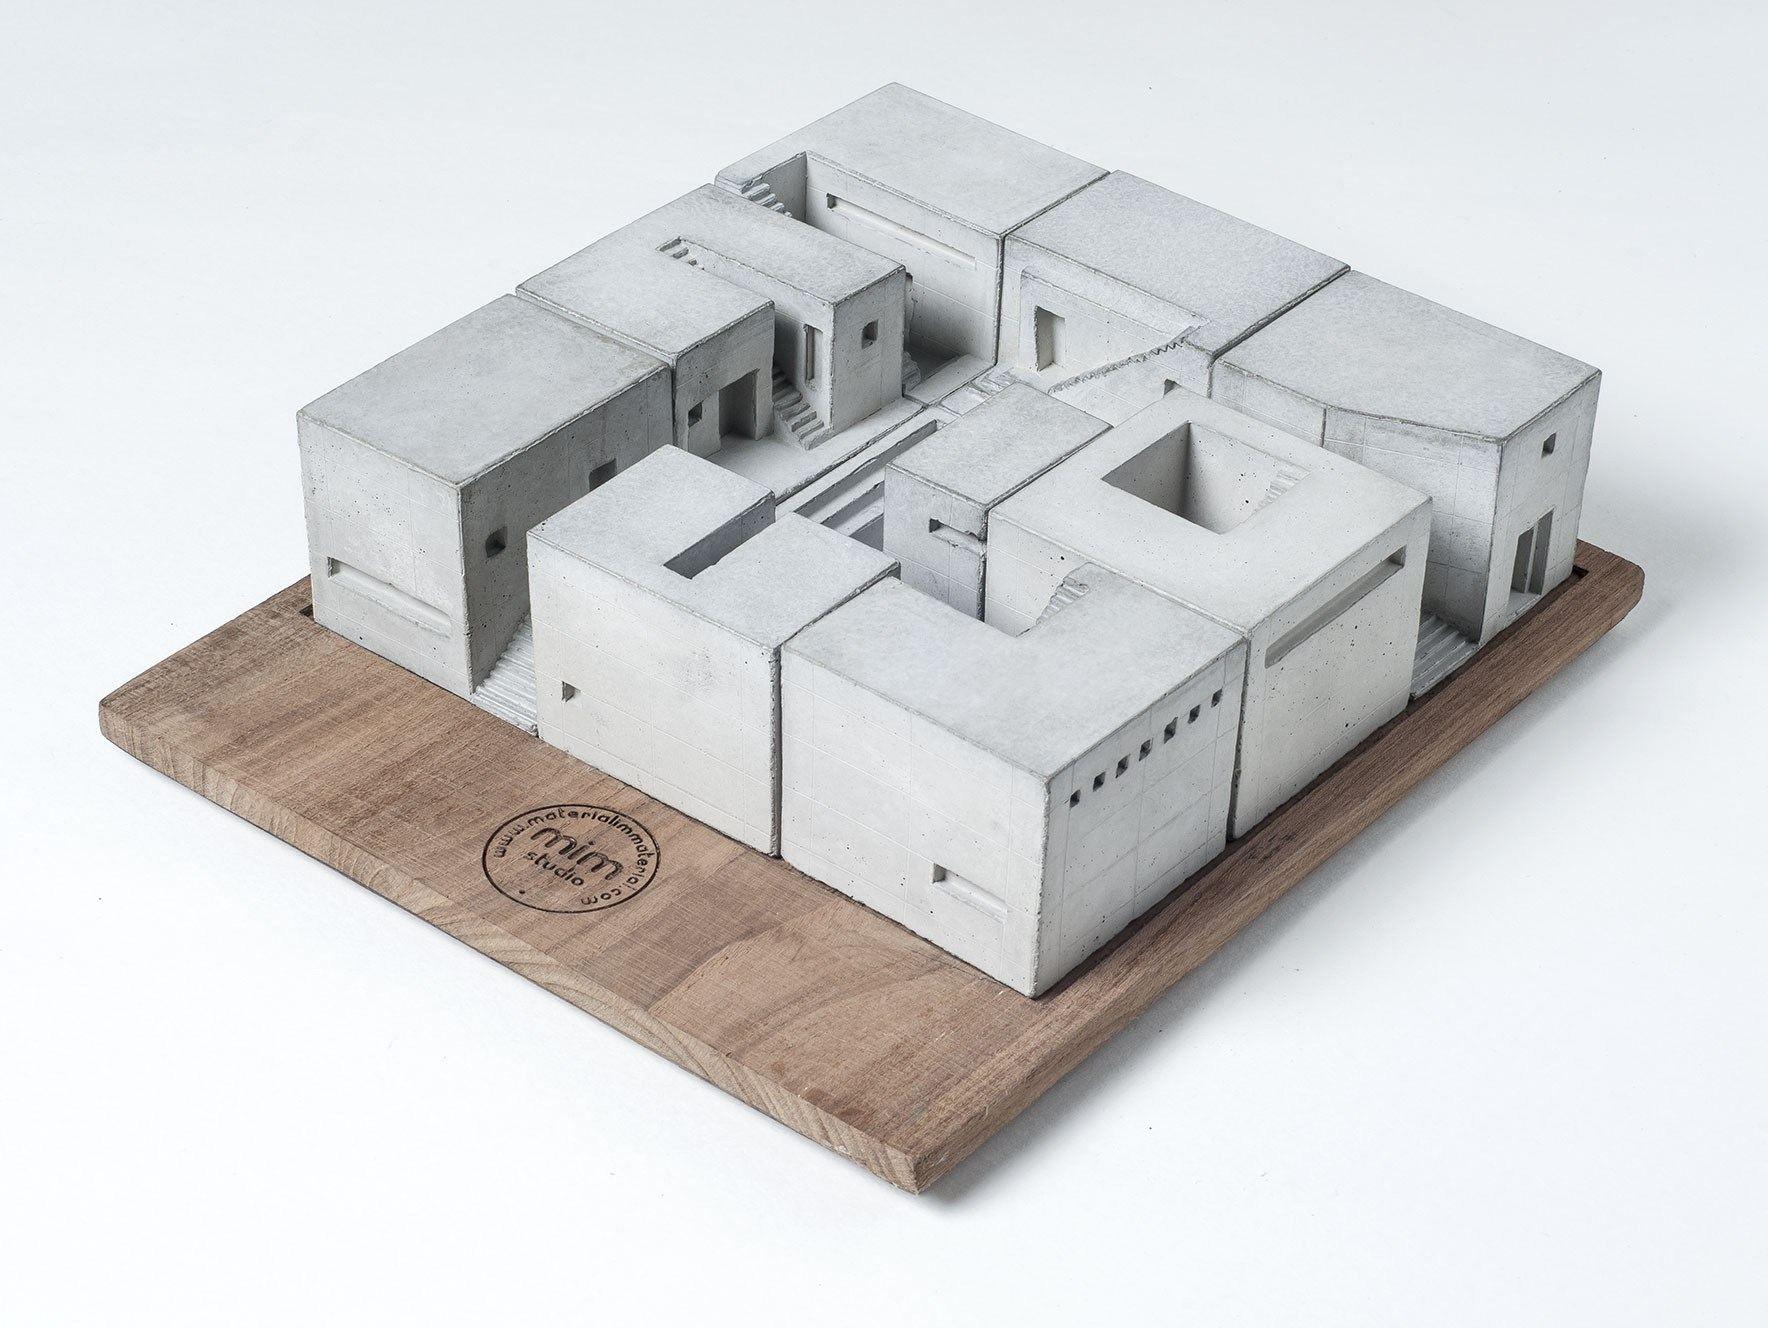 Concrete Architectural Model Miniature Homes